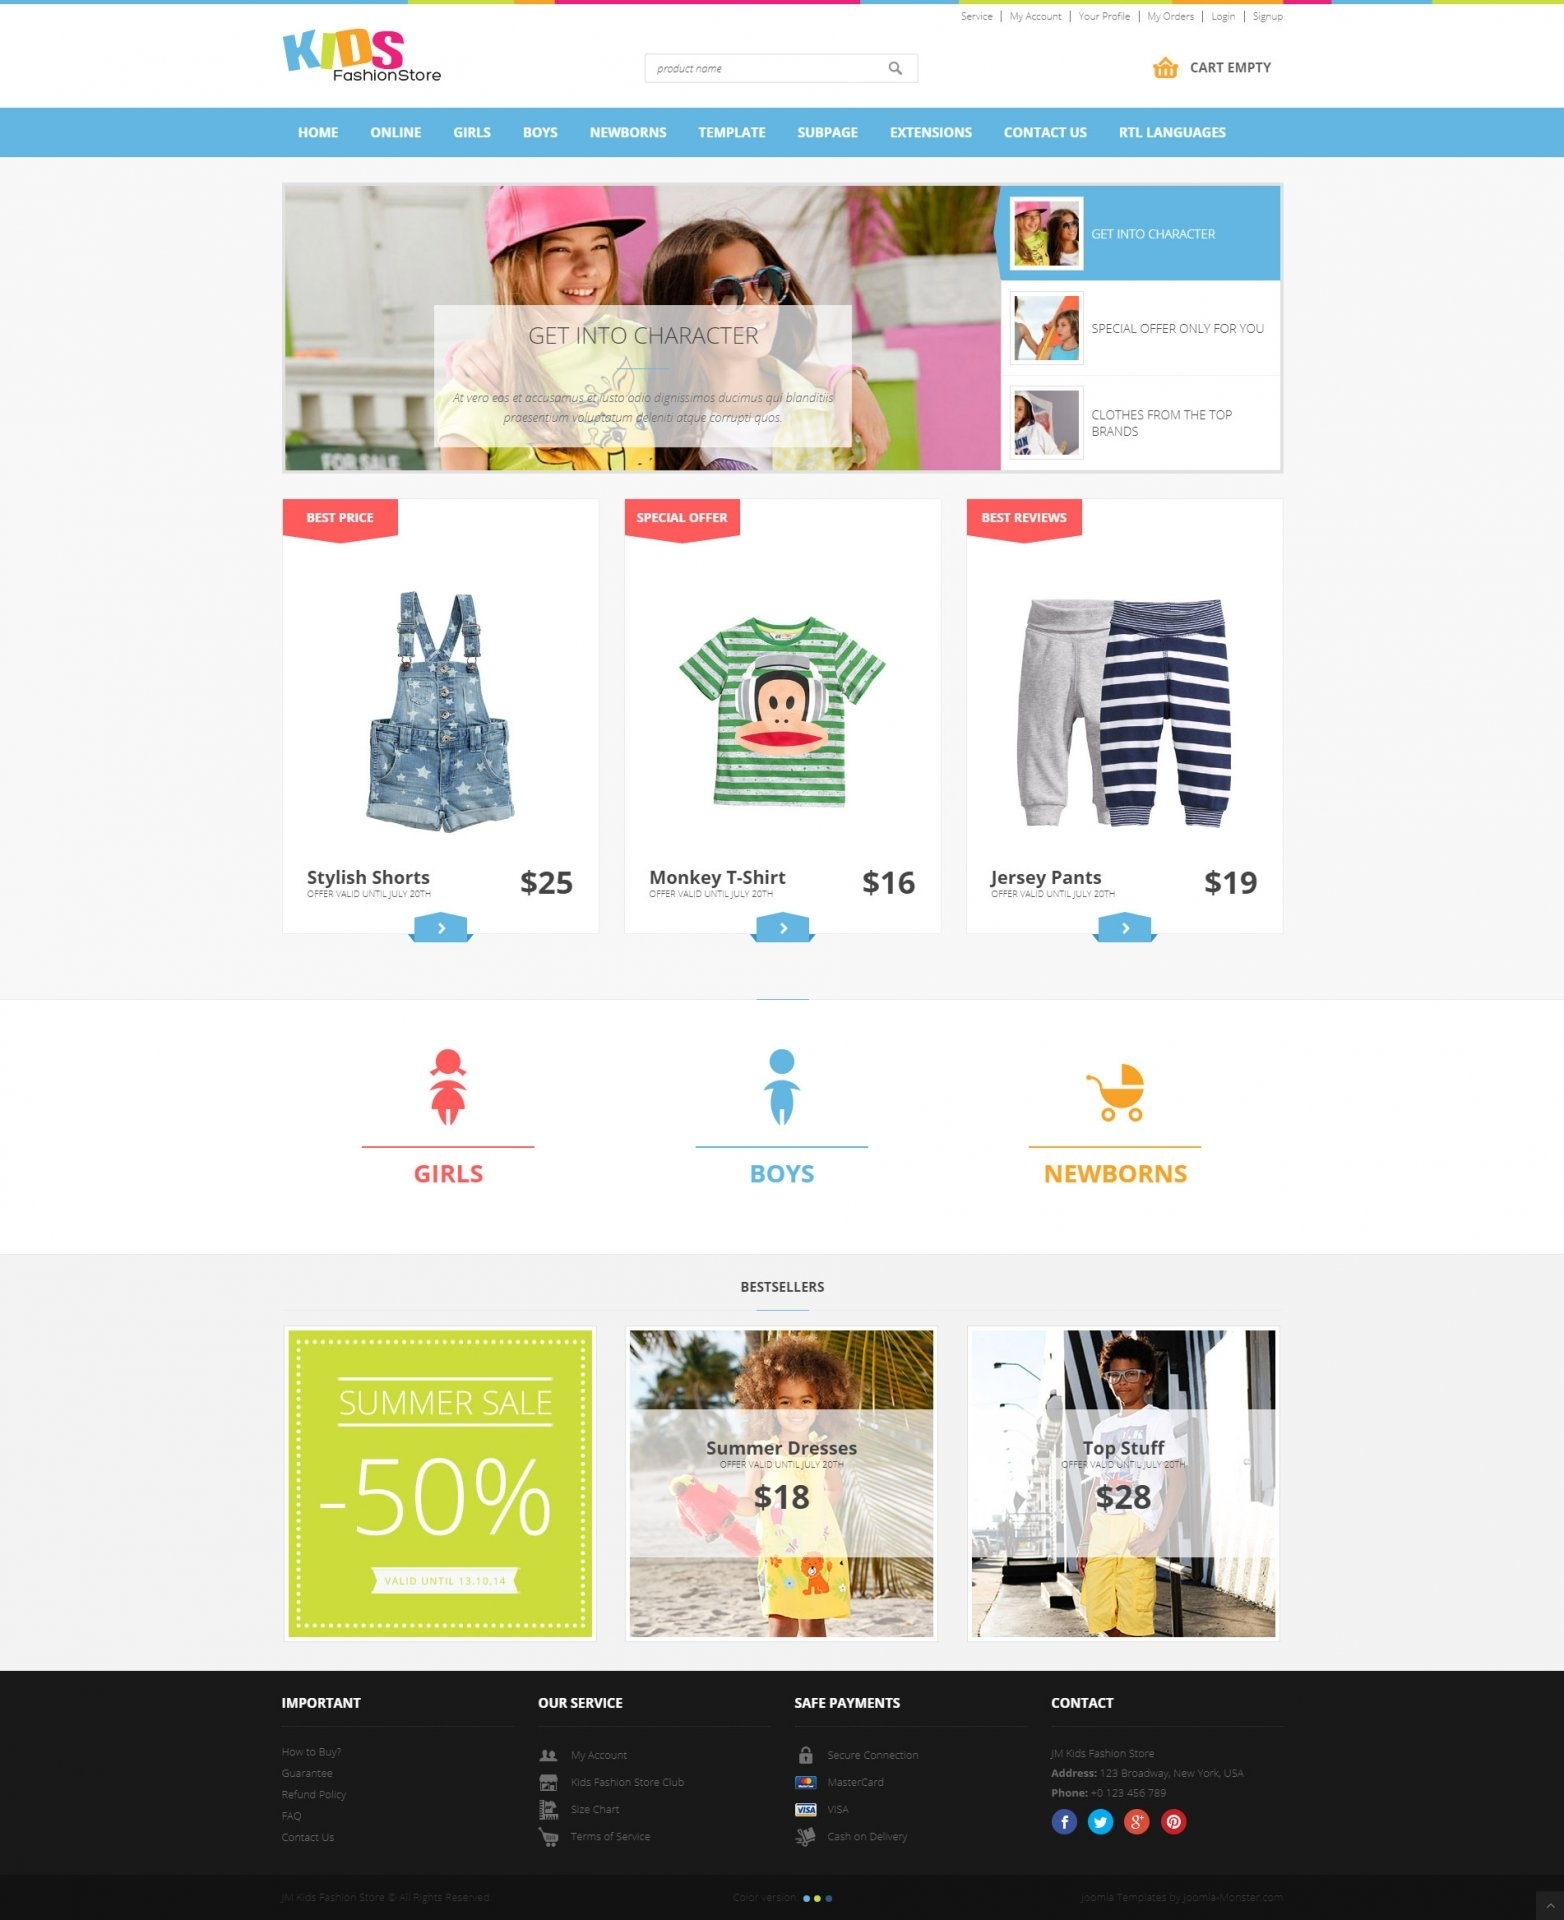 Websites Built On Joomla-Monster's Templates - Joomla-Monster pertaining to Free Templates Online For Children